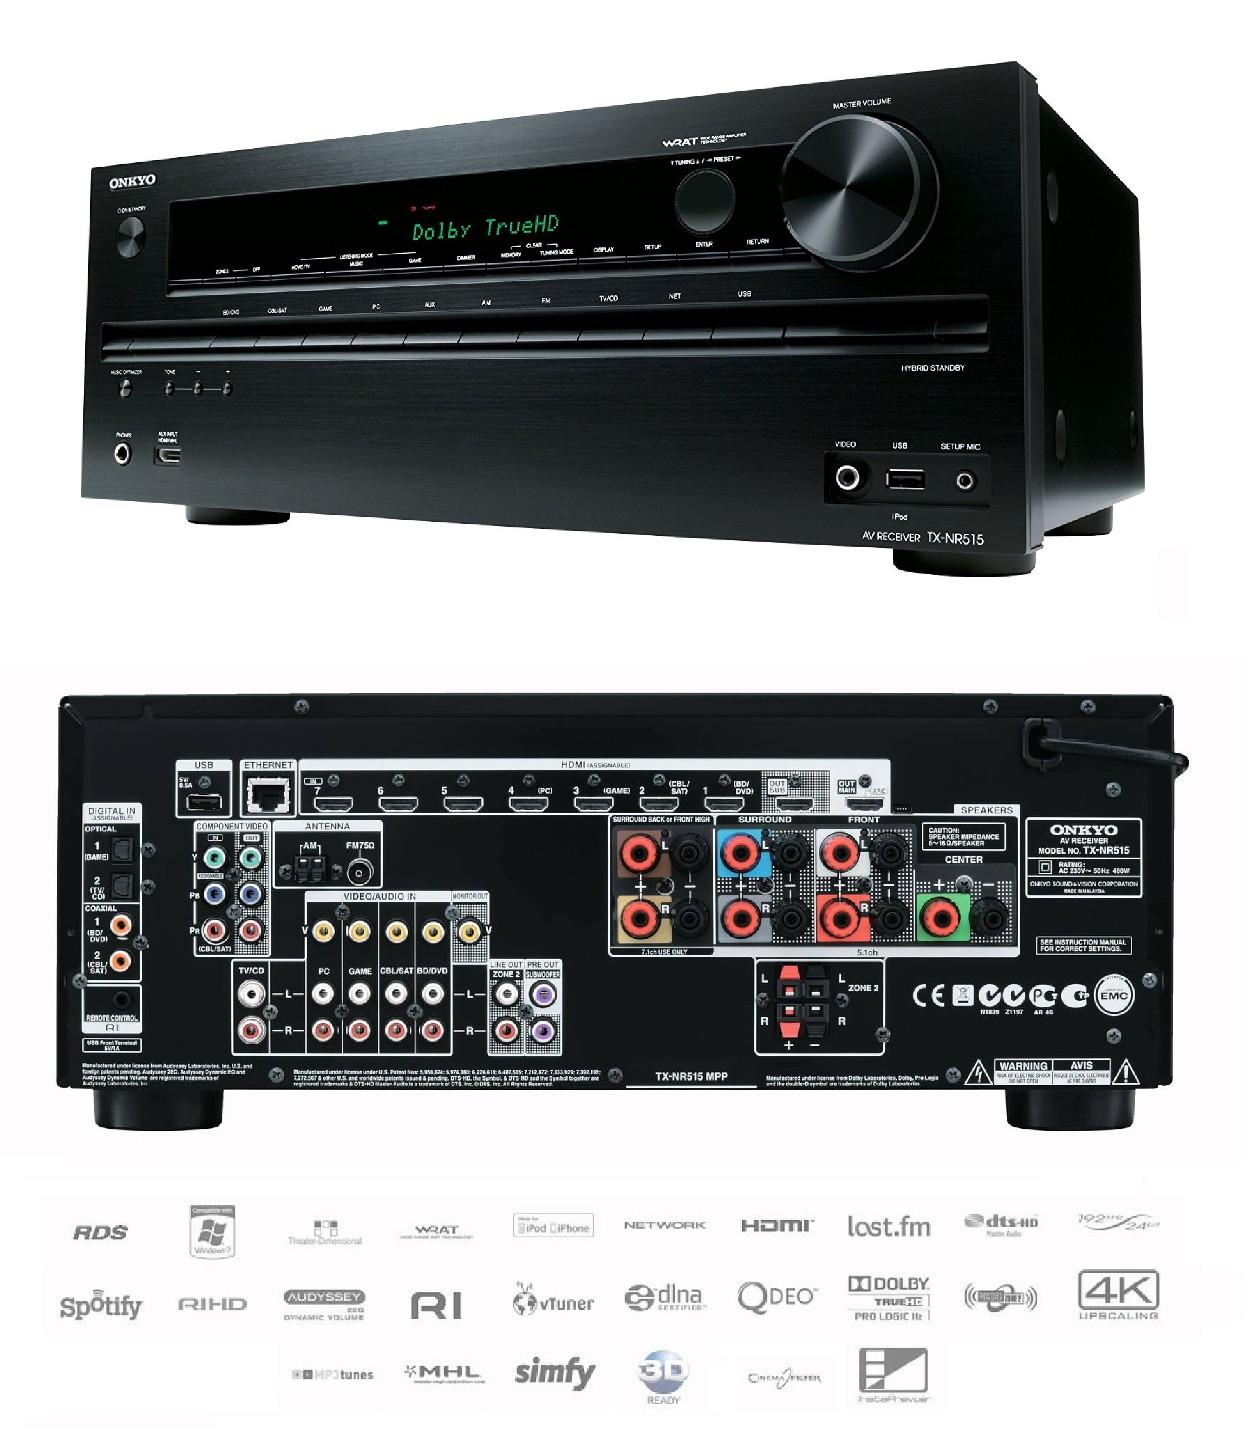 Details About Onkyo TX NR515 3D Network 72 Home Cinema AV HD Receiver 10x HDMI Dolby TrueHD